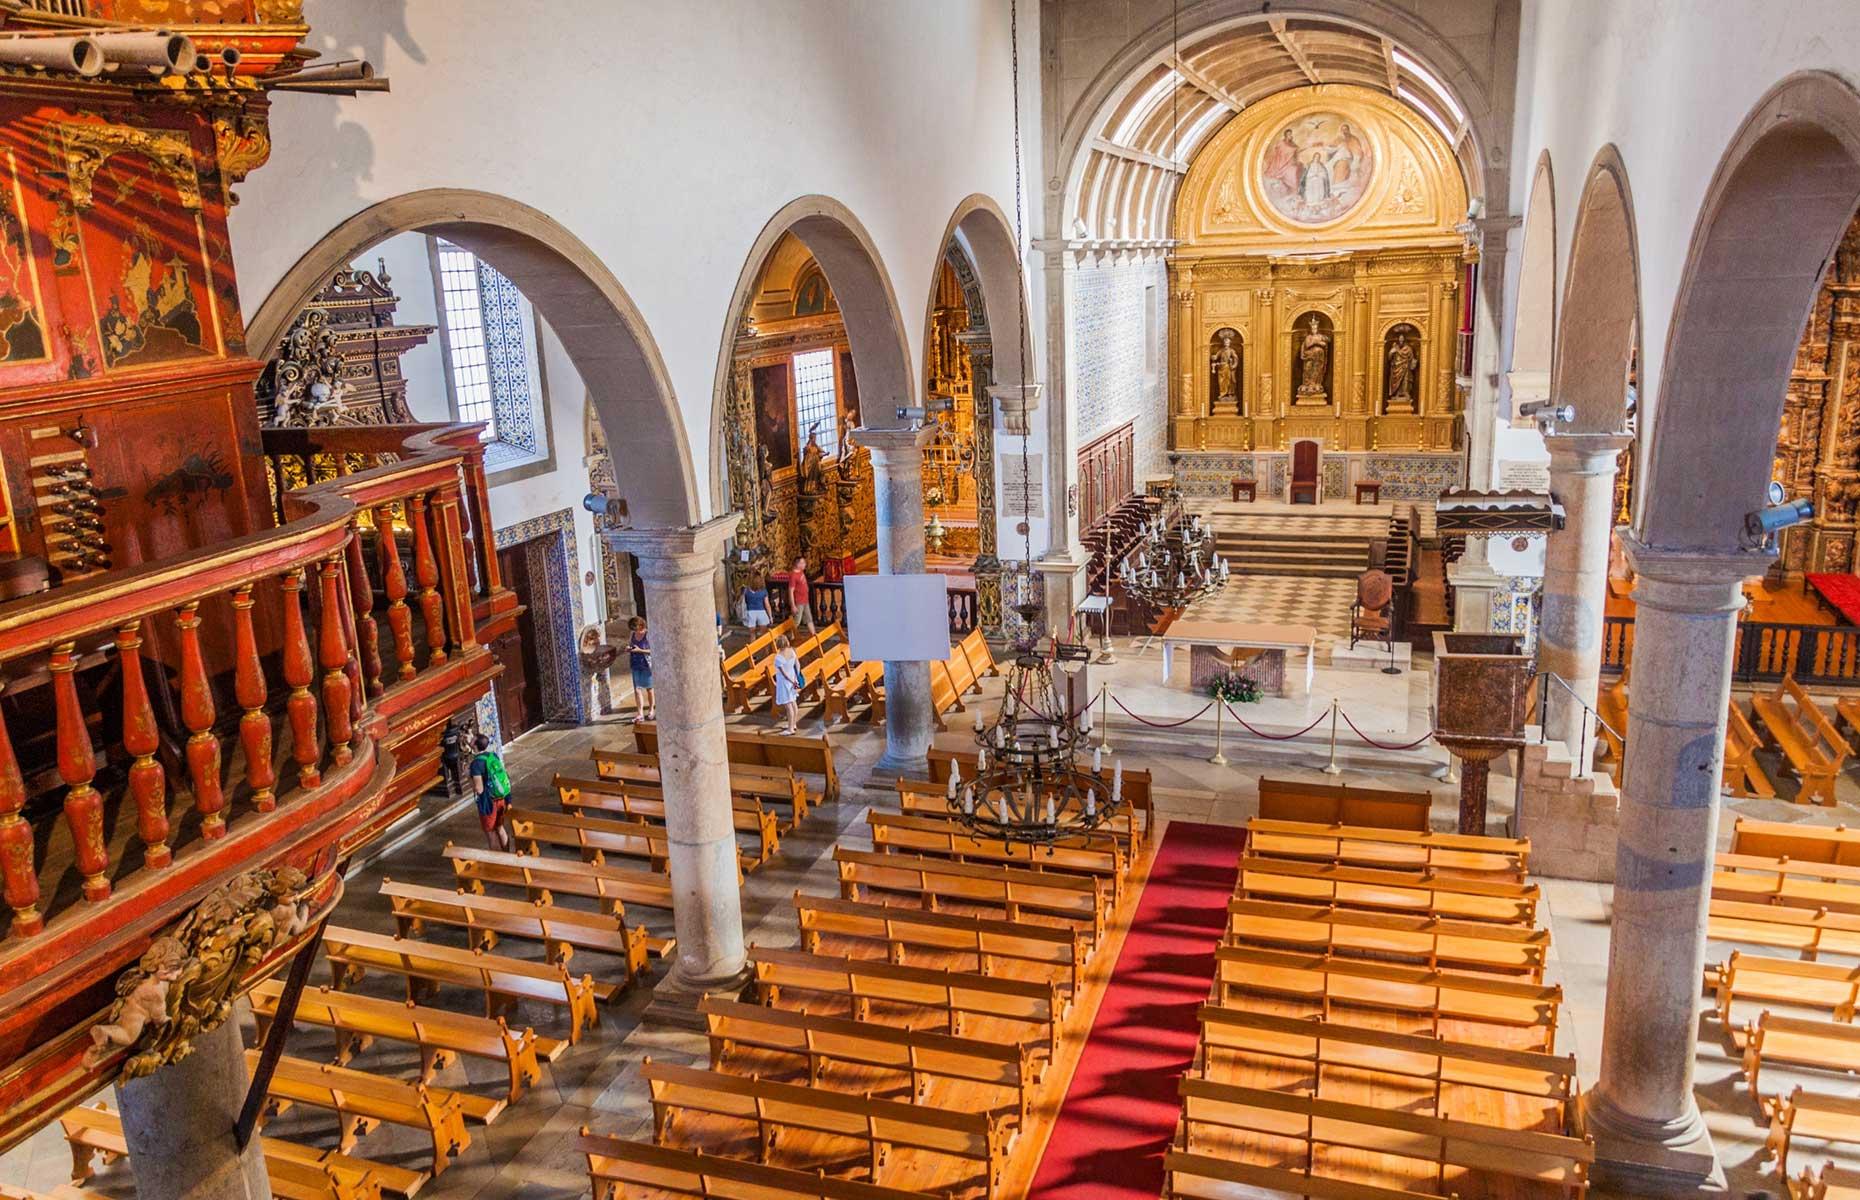 Faro cathedral (Image: Matyas Rehak/Shutterstock)